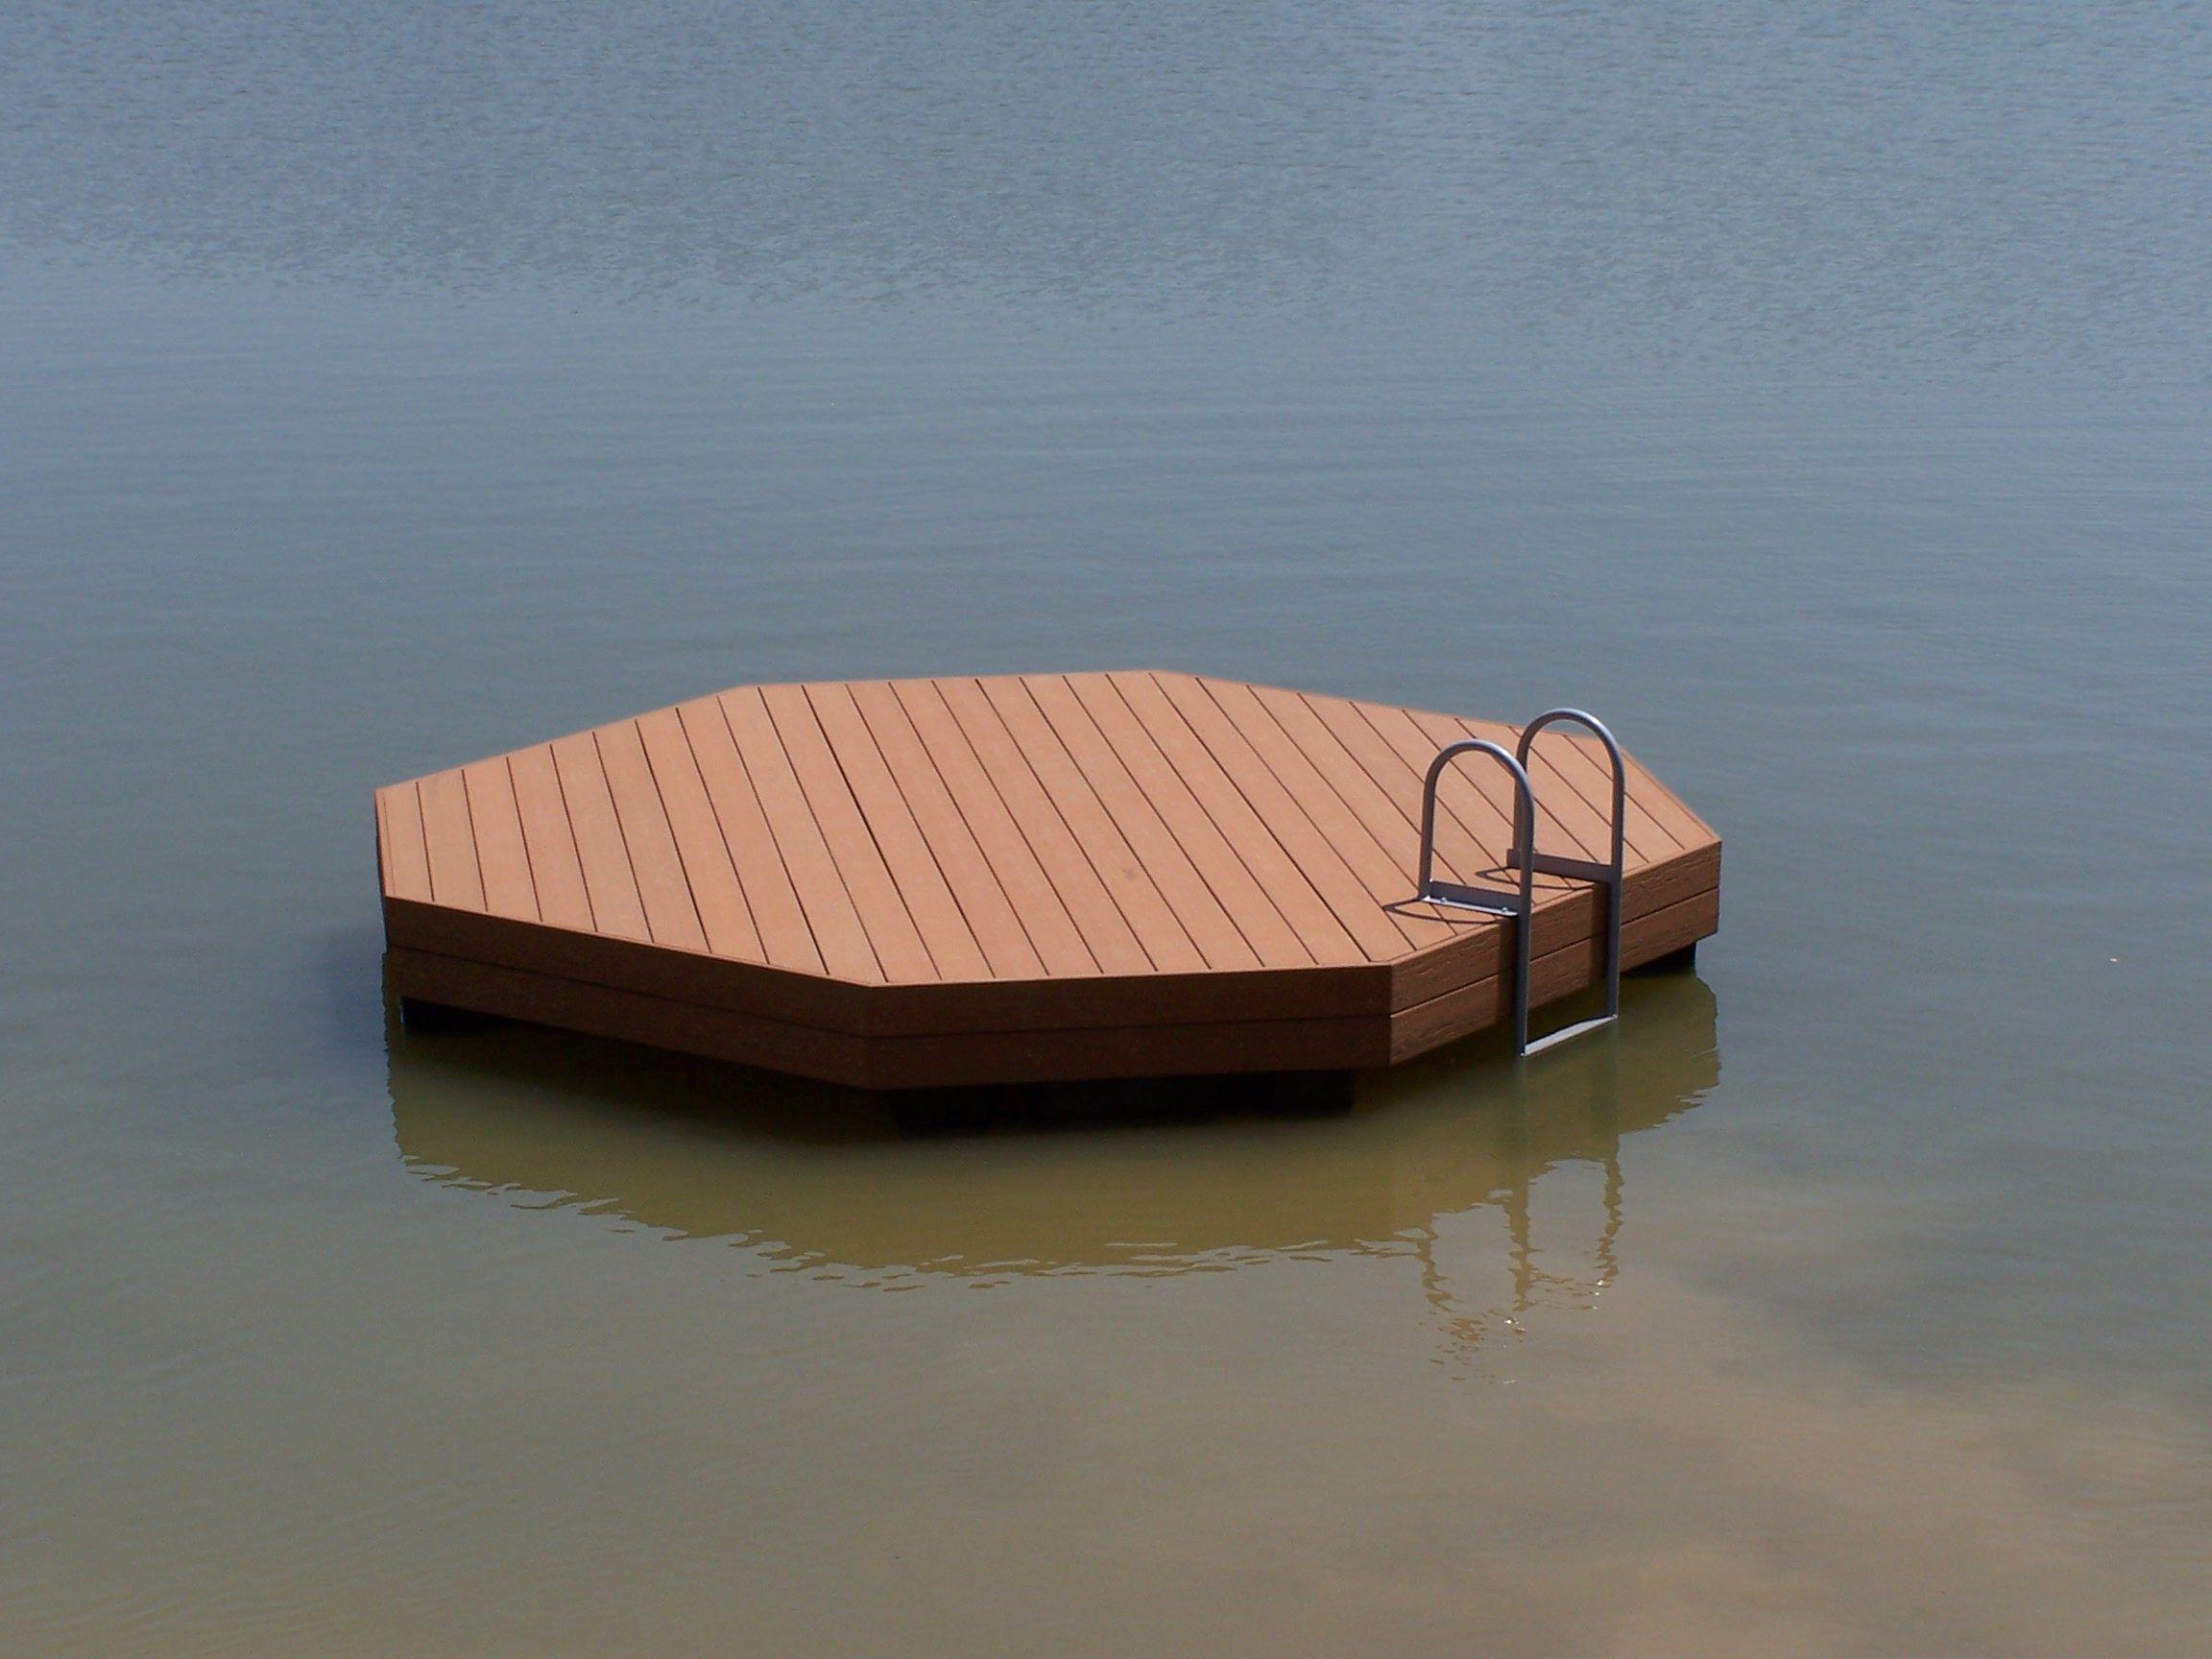 Floating fishing and swimming docks platinum ponds for Floating fishing platform